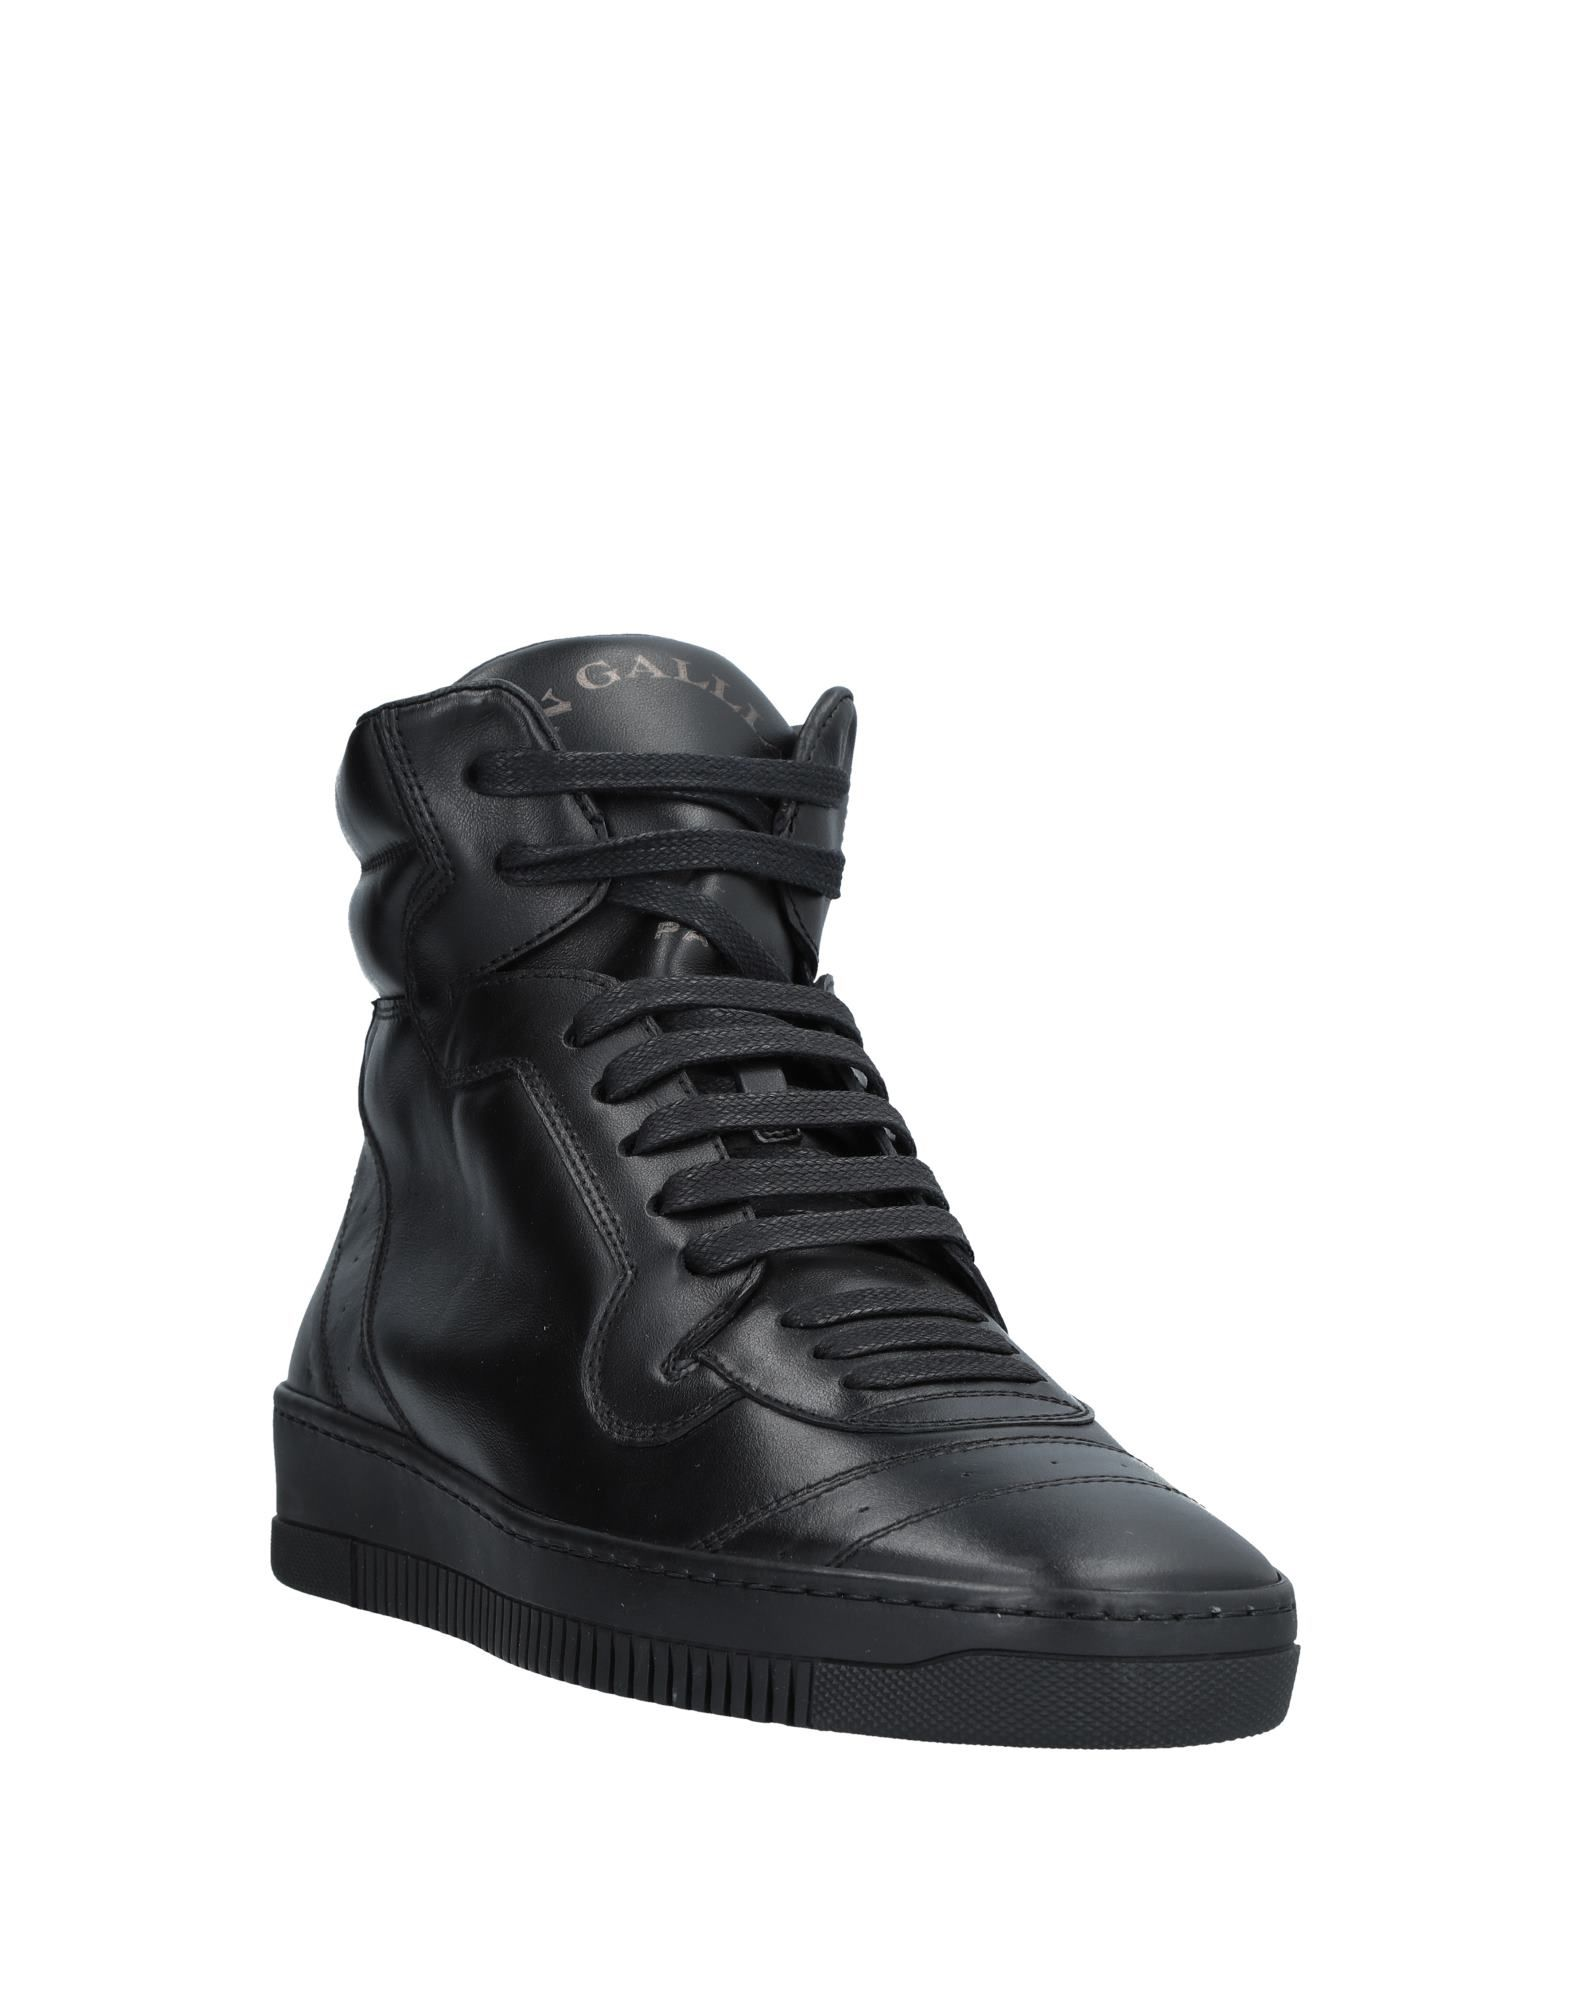 Sneakers Galliano John Galliano Sneakers Uomo - 11538164IU a1a393